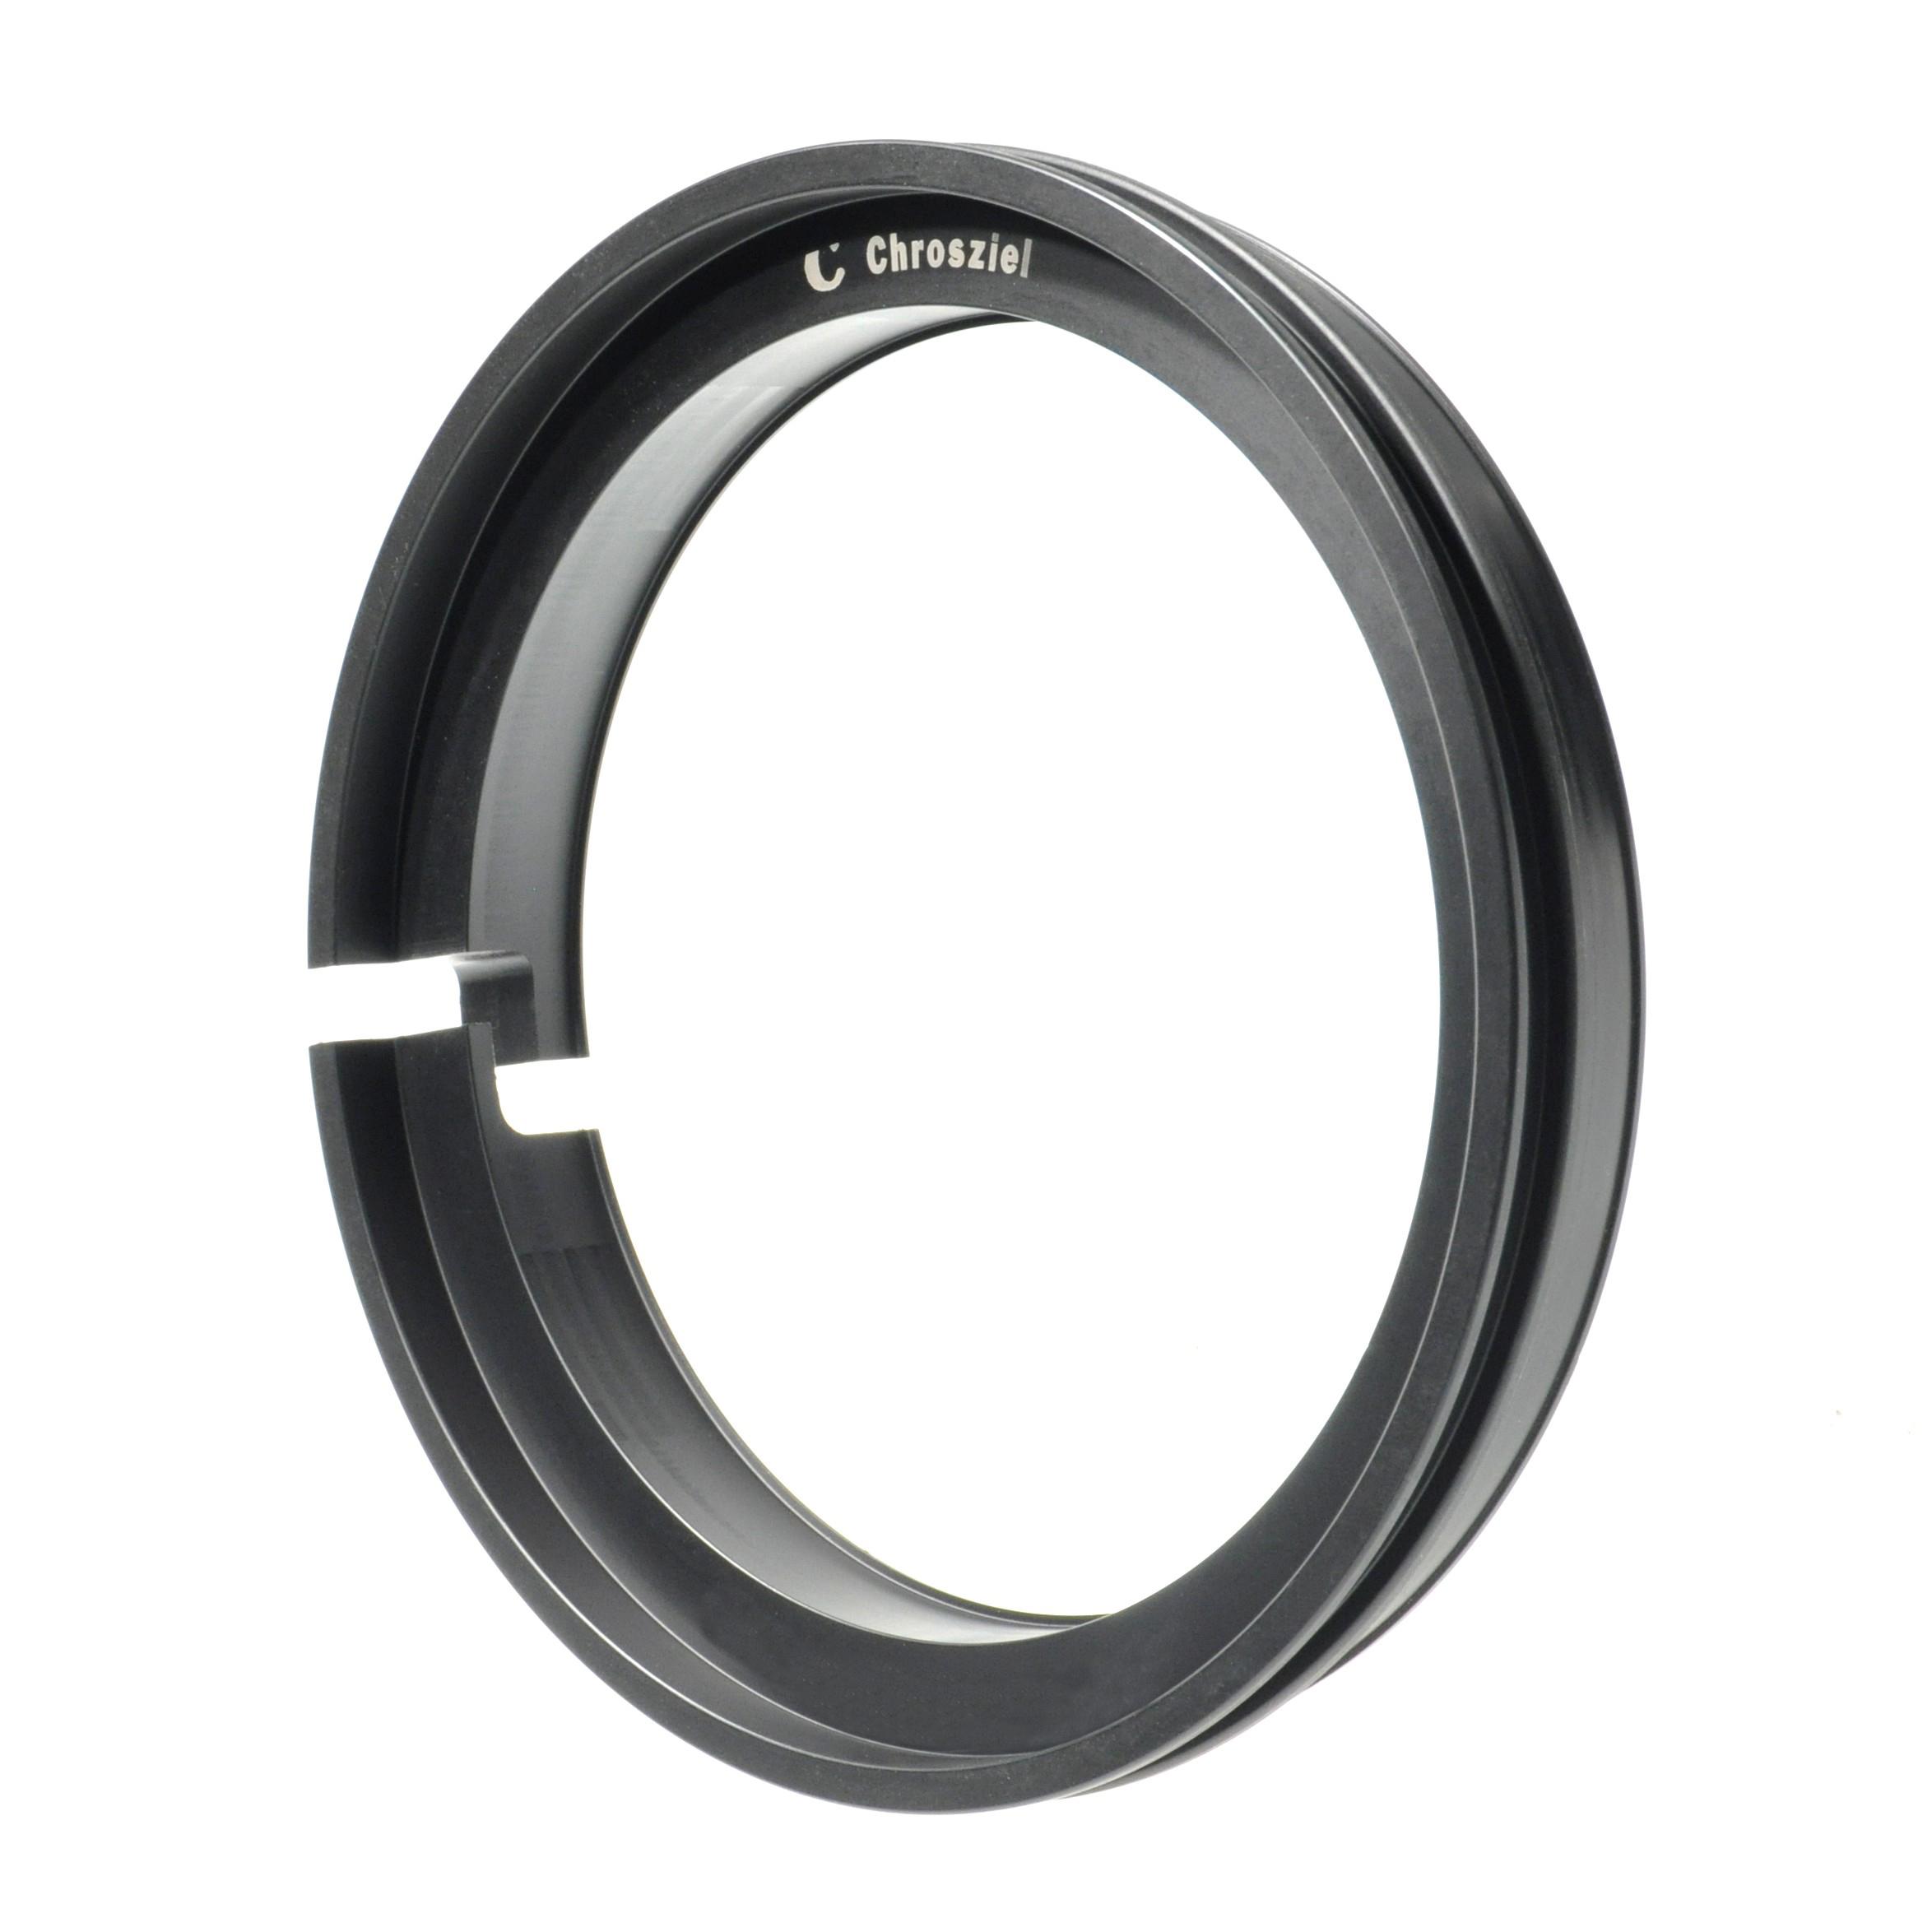 Intermediate Ring 130:104 clamp